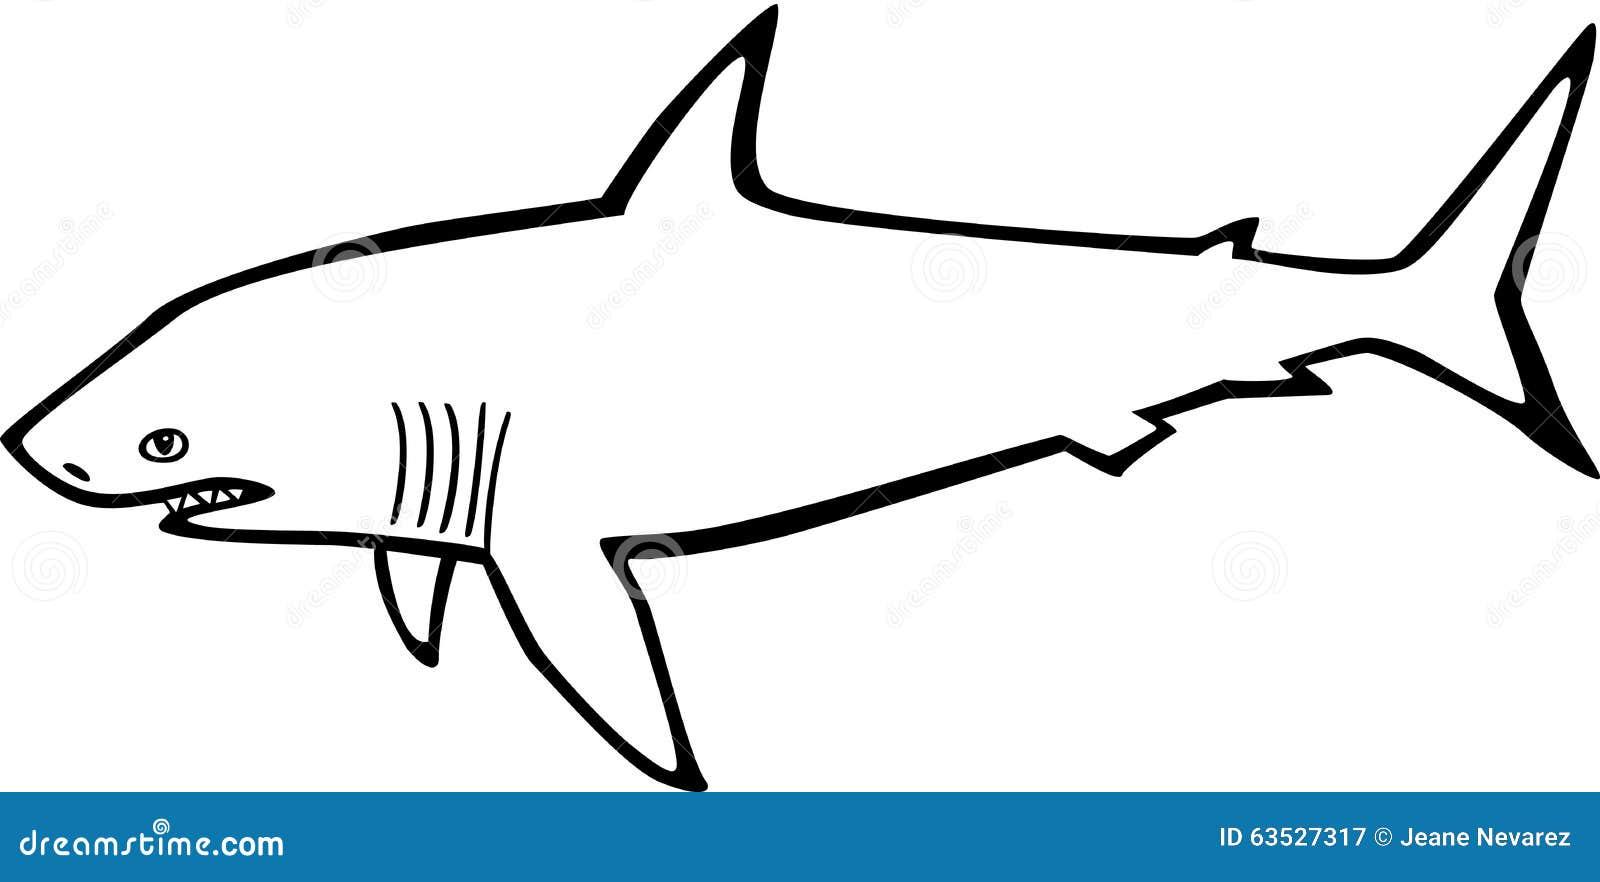 Shark Stock Vector - Image: 63527317